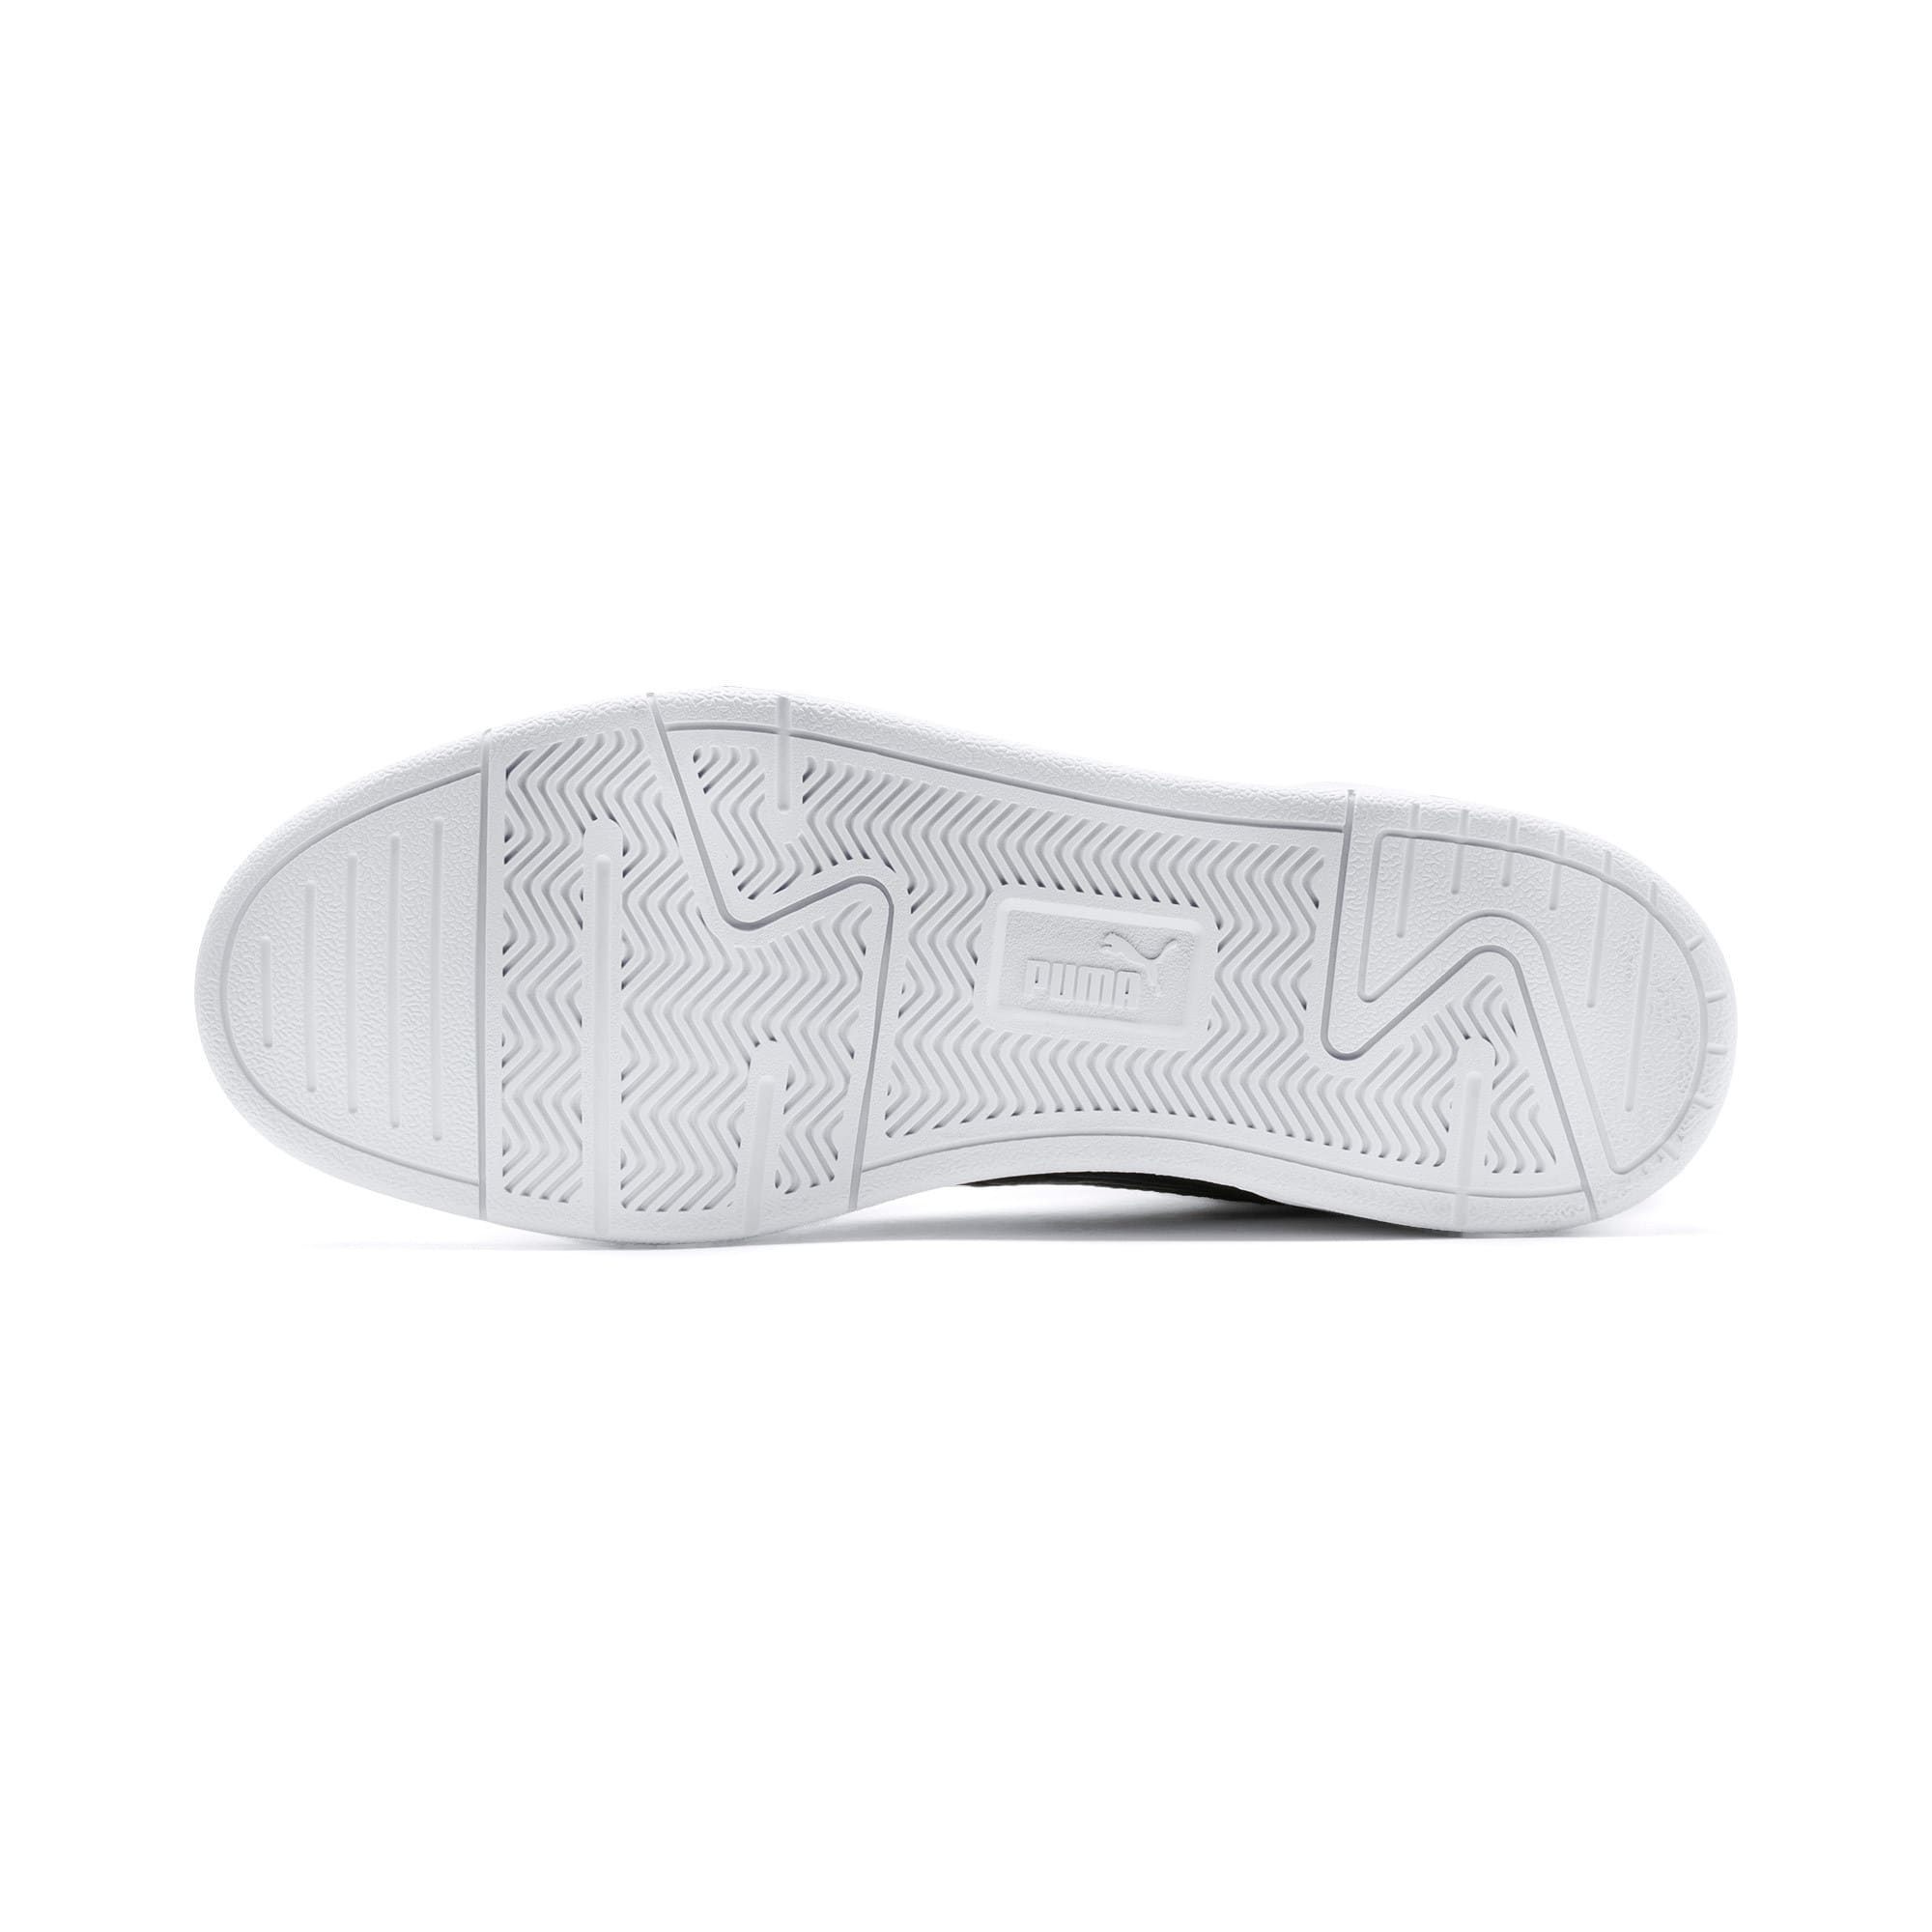 Thumbnail 5 of Caracal Sneakers, Puma White-Puma Black, medium